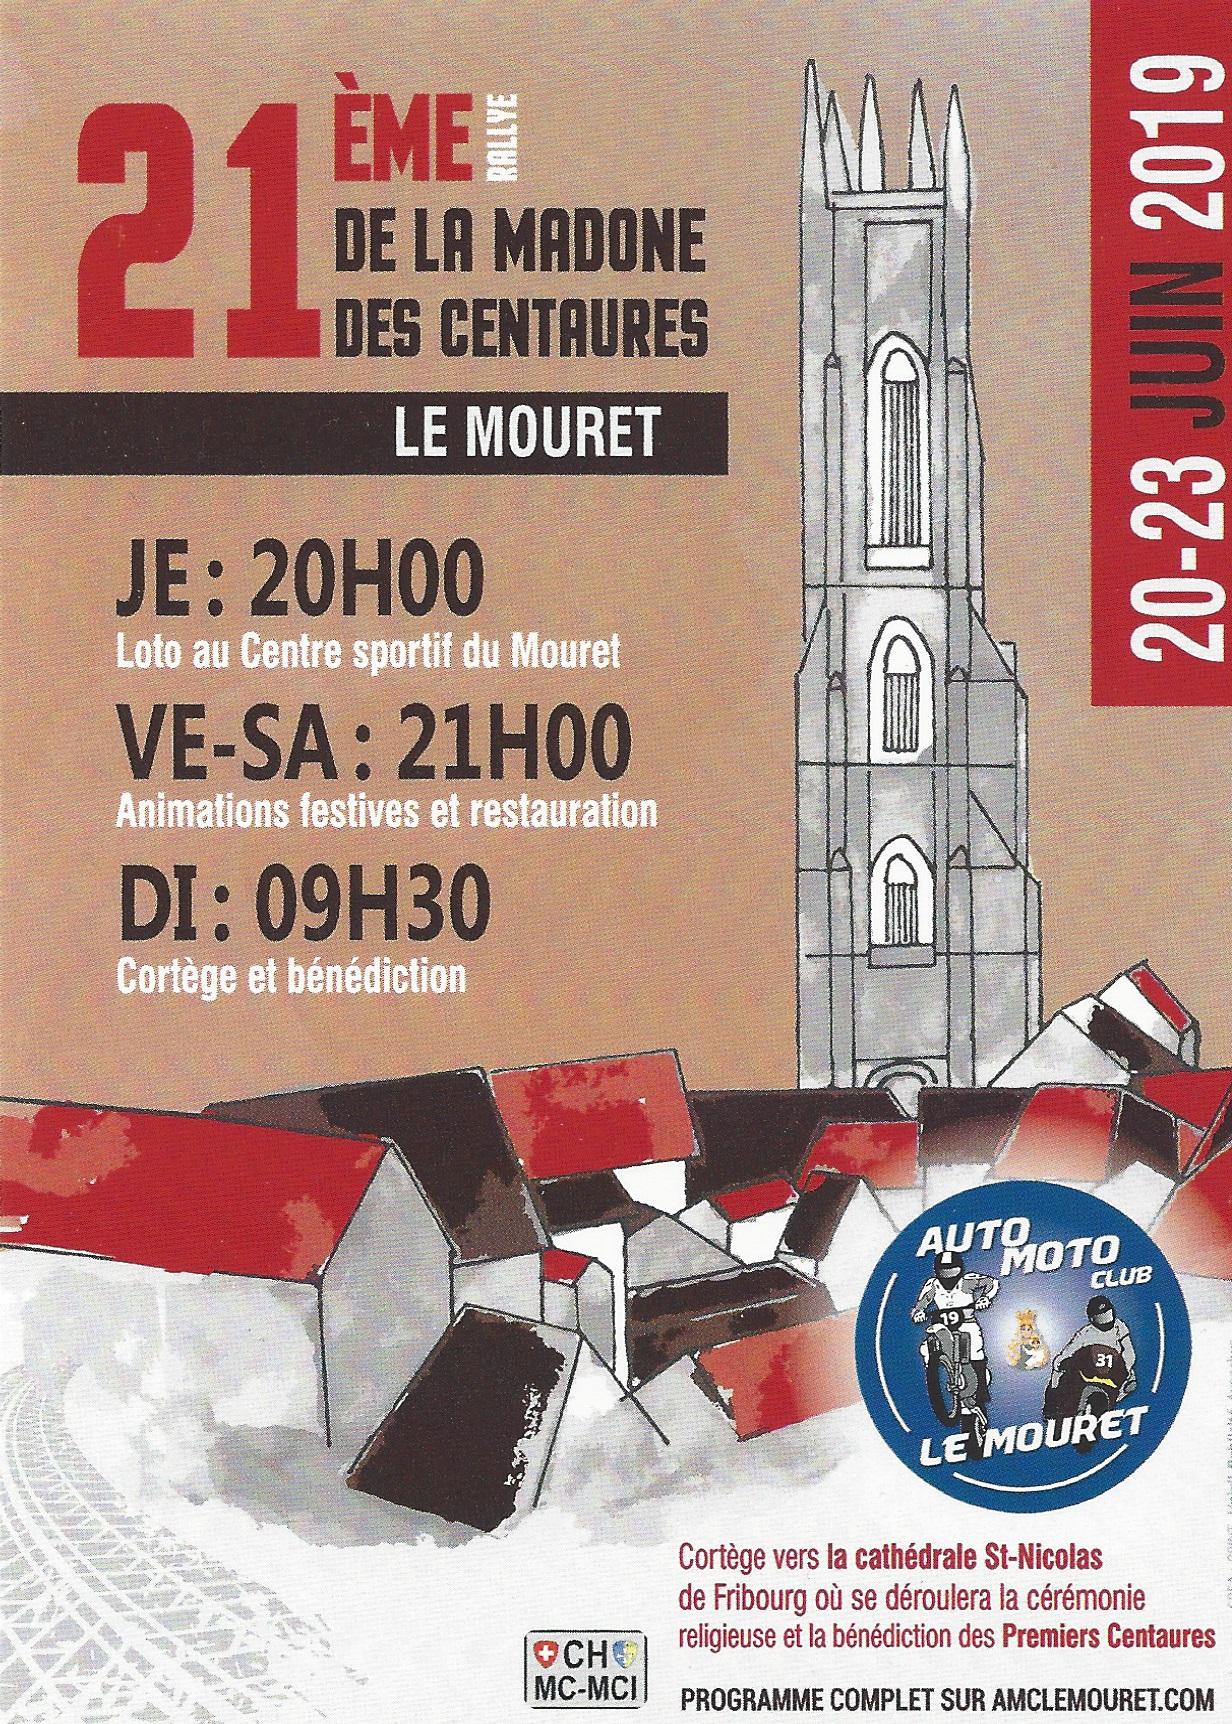 Flyer Madone des centaures